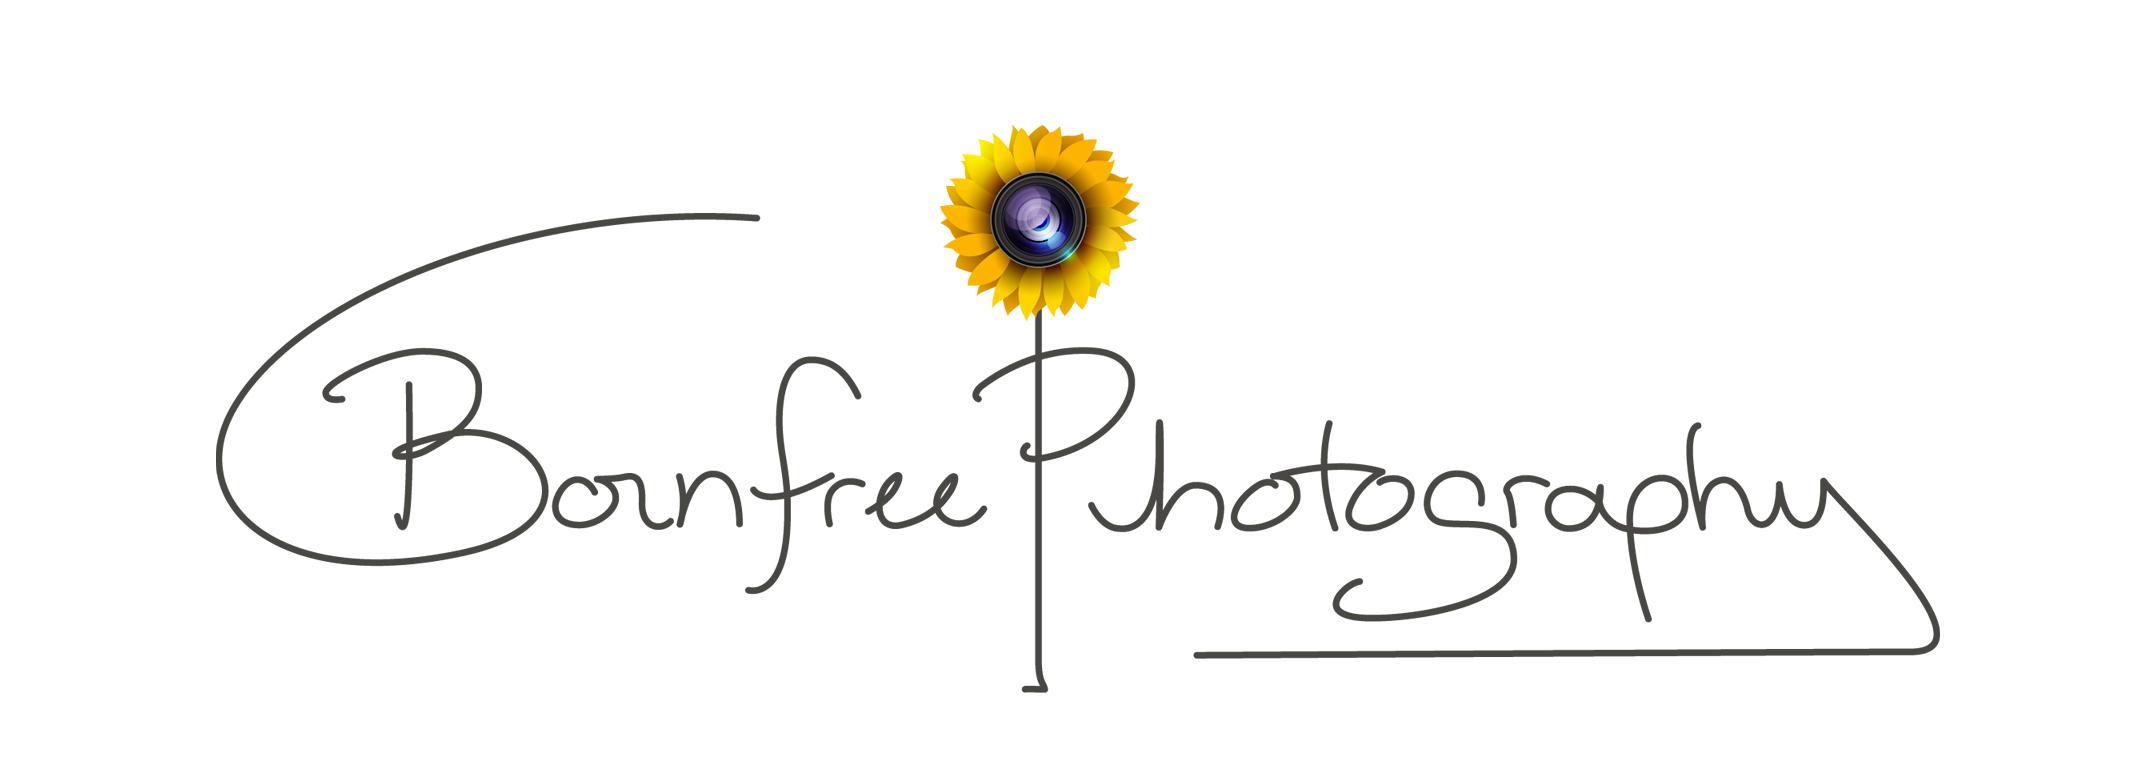 Bornfree Photography.jpg